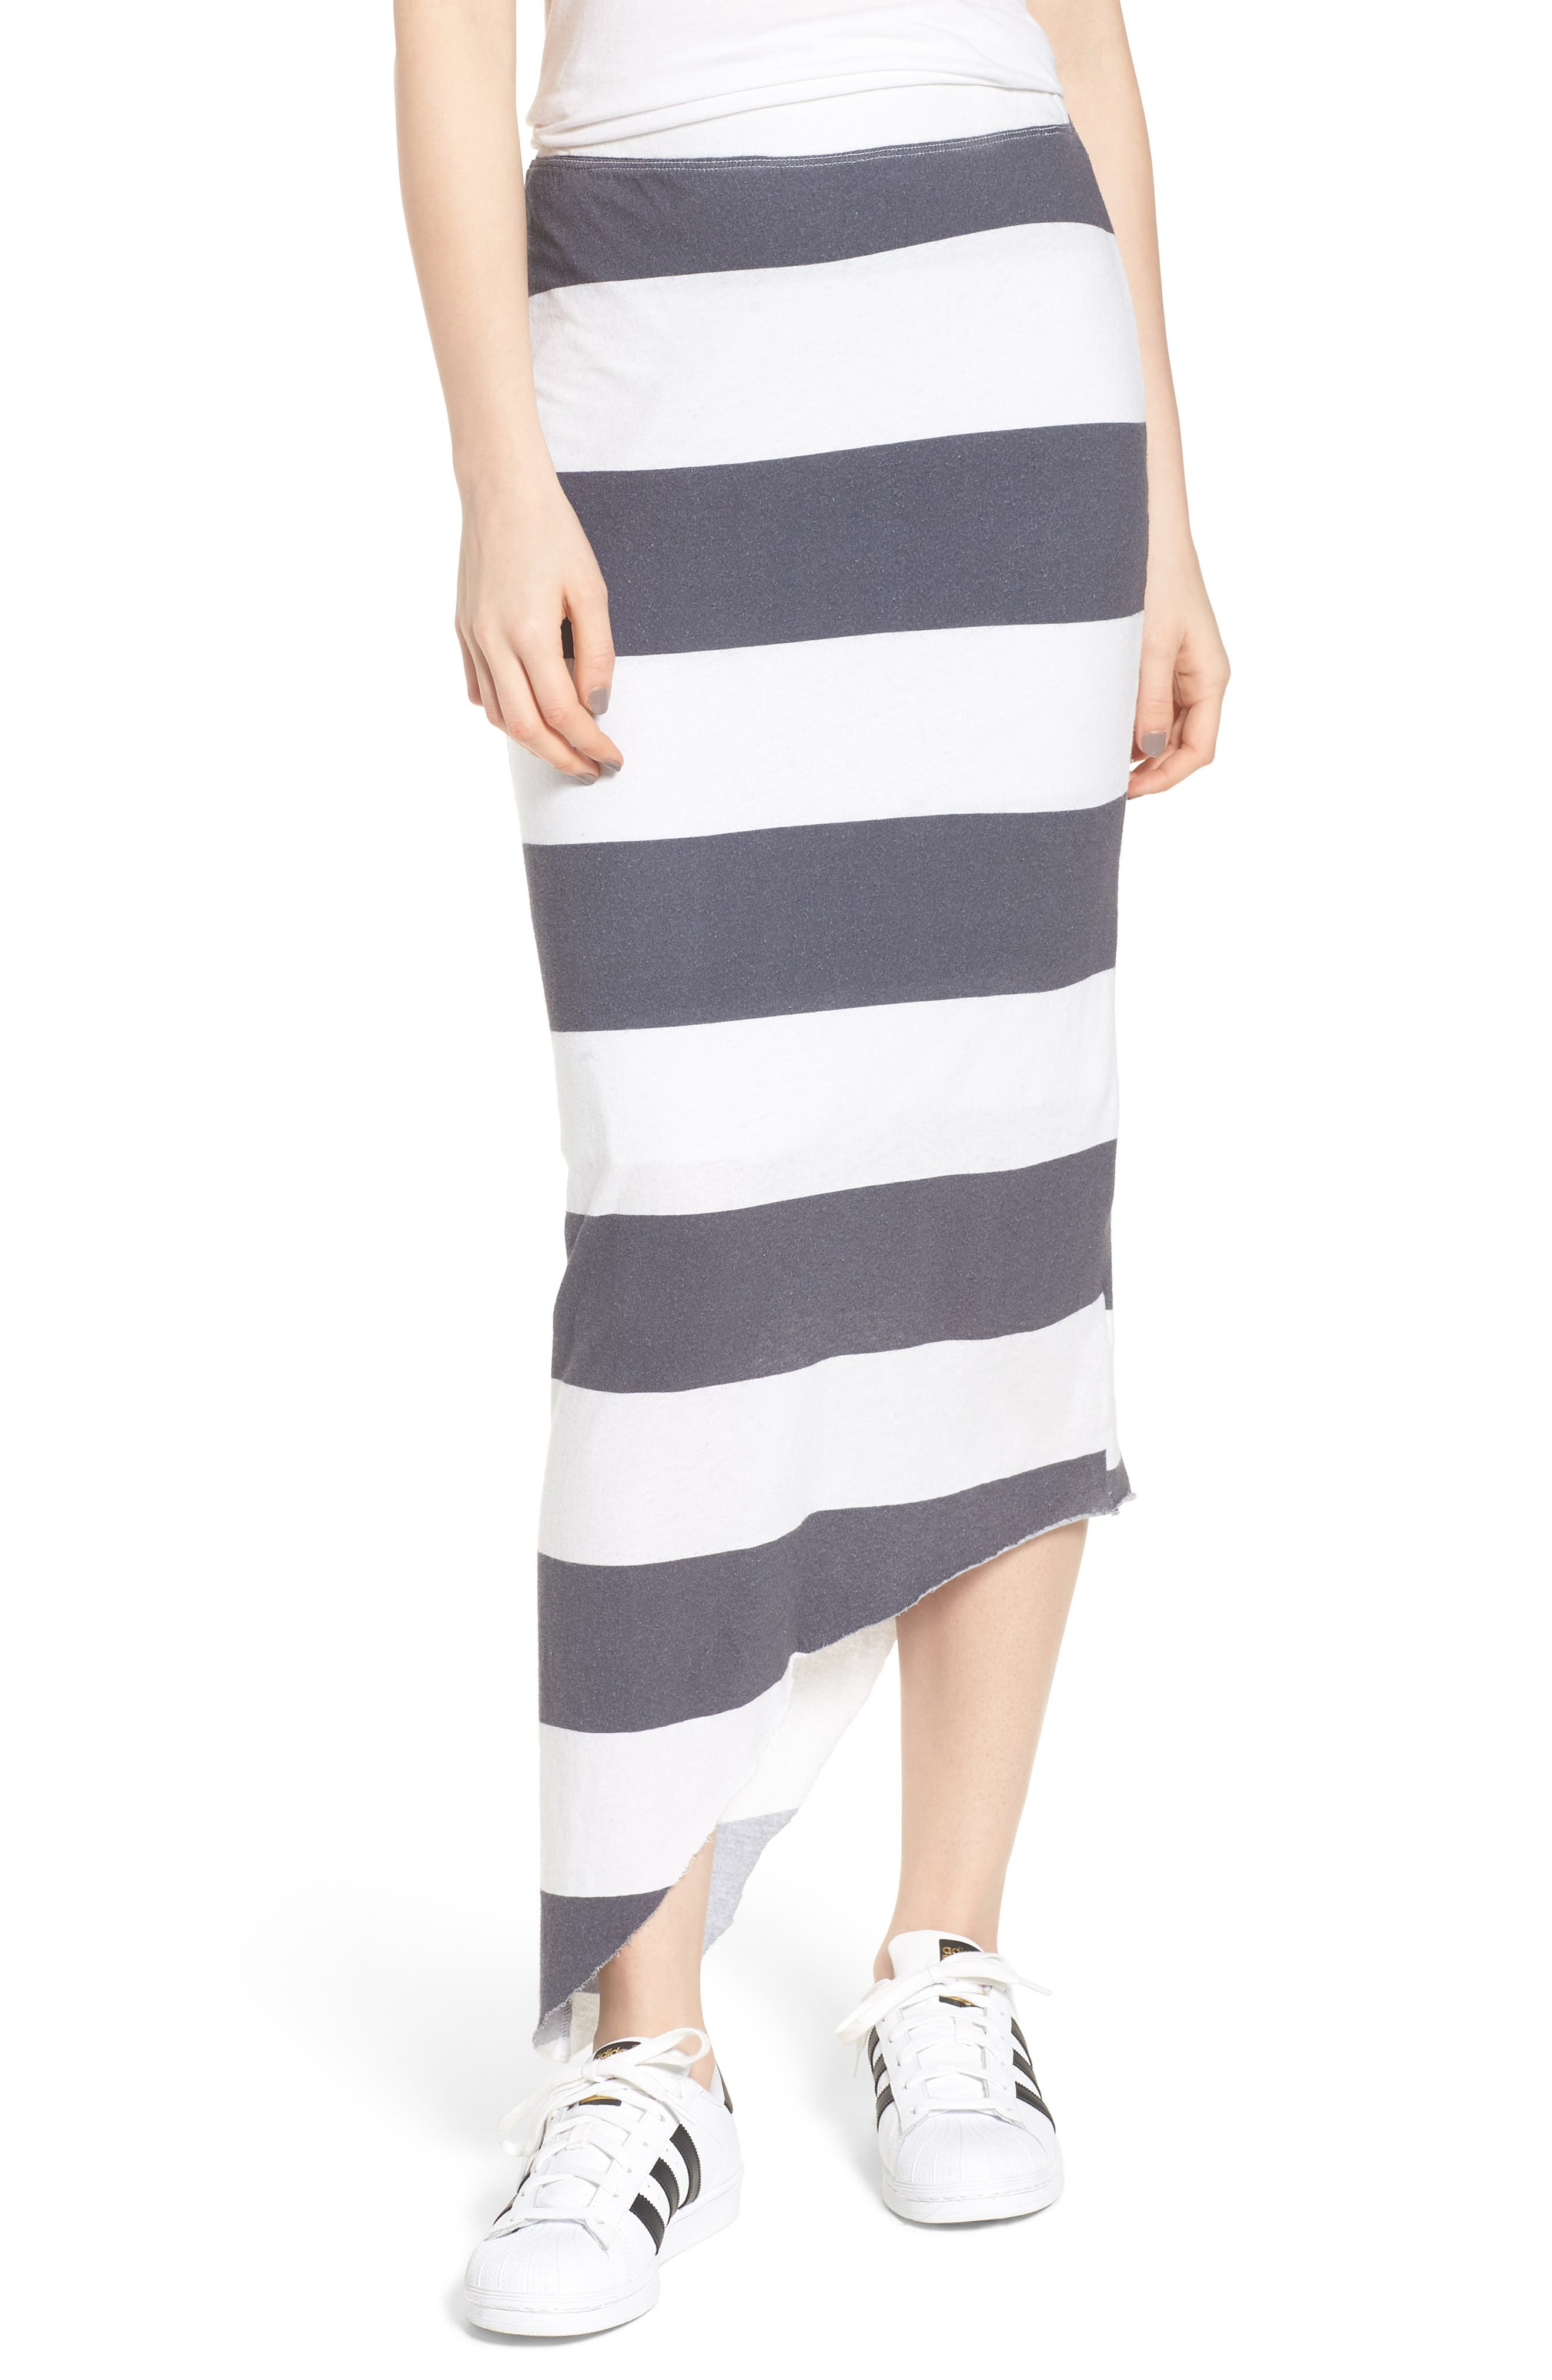 Frank & Eileen Tee Lab Stripe Asymmetrical Skirt